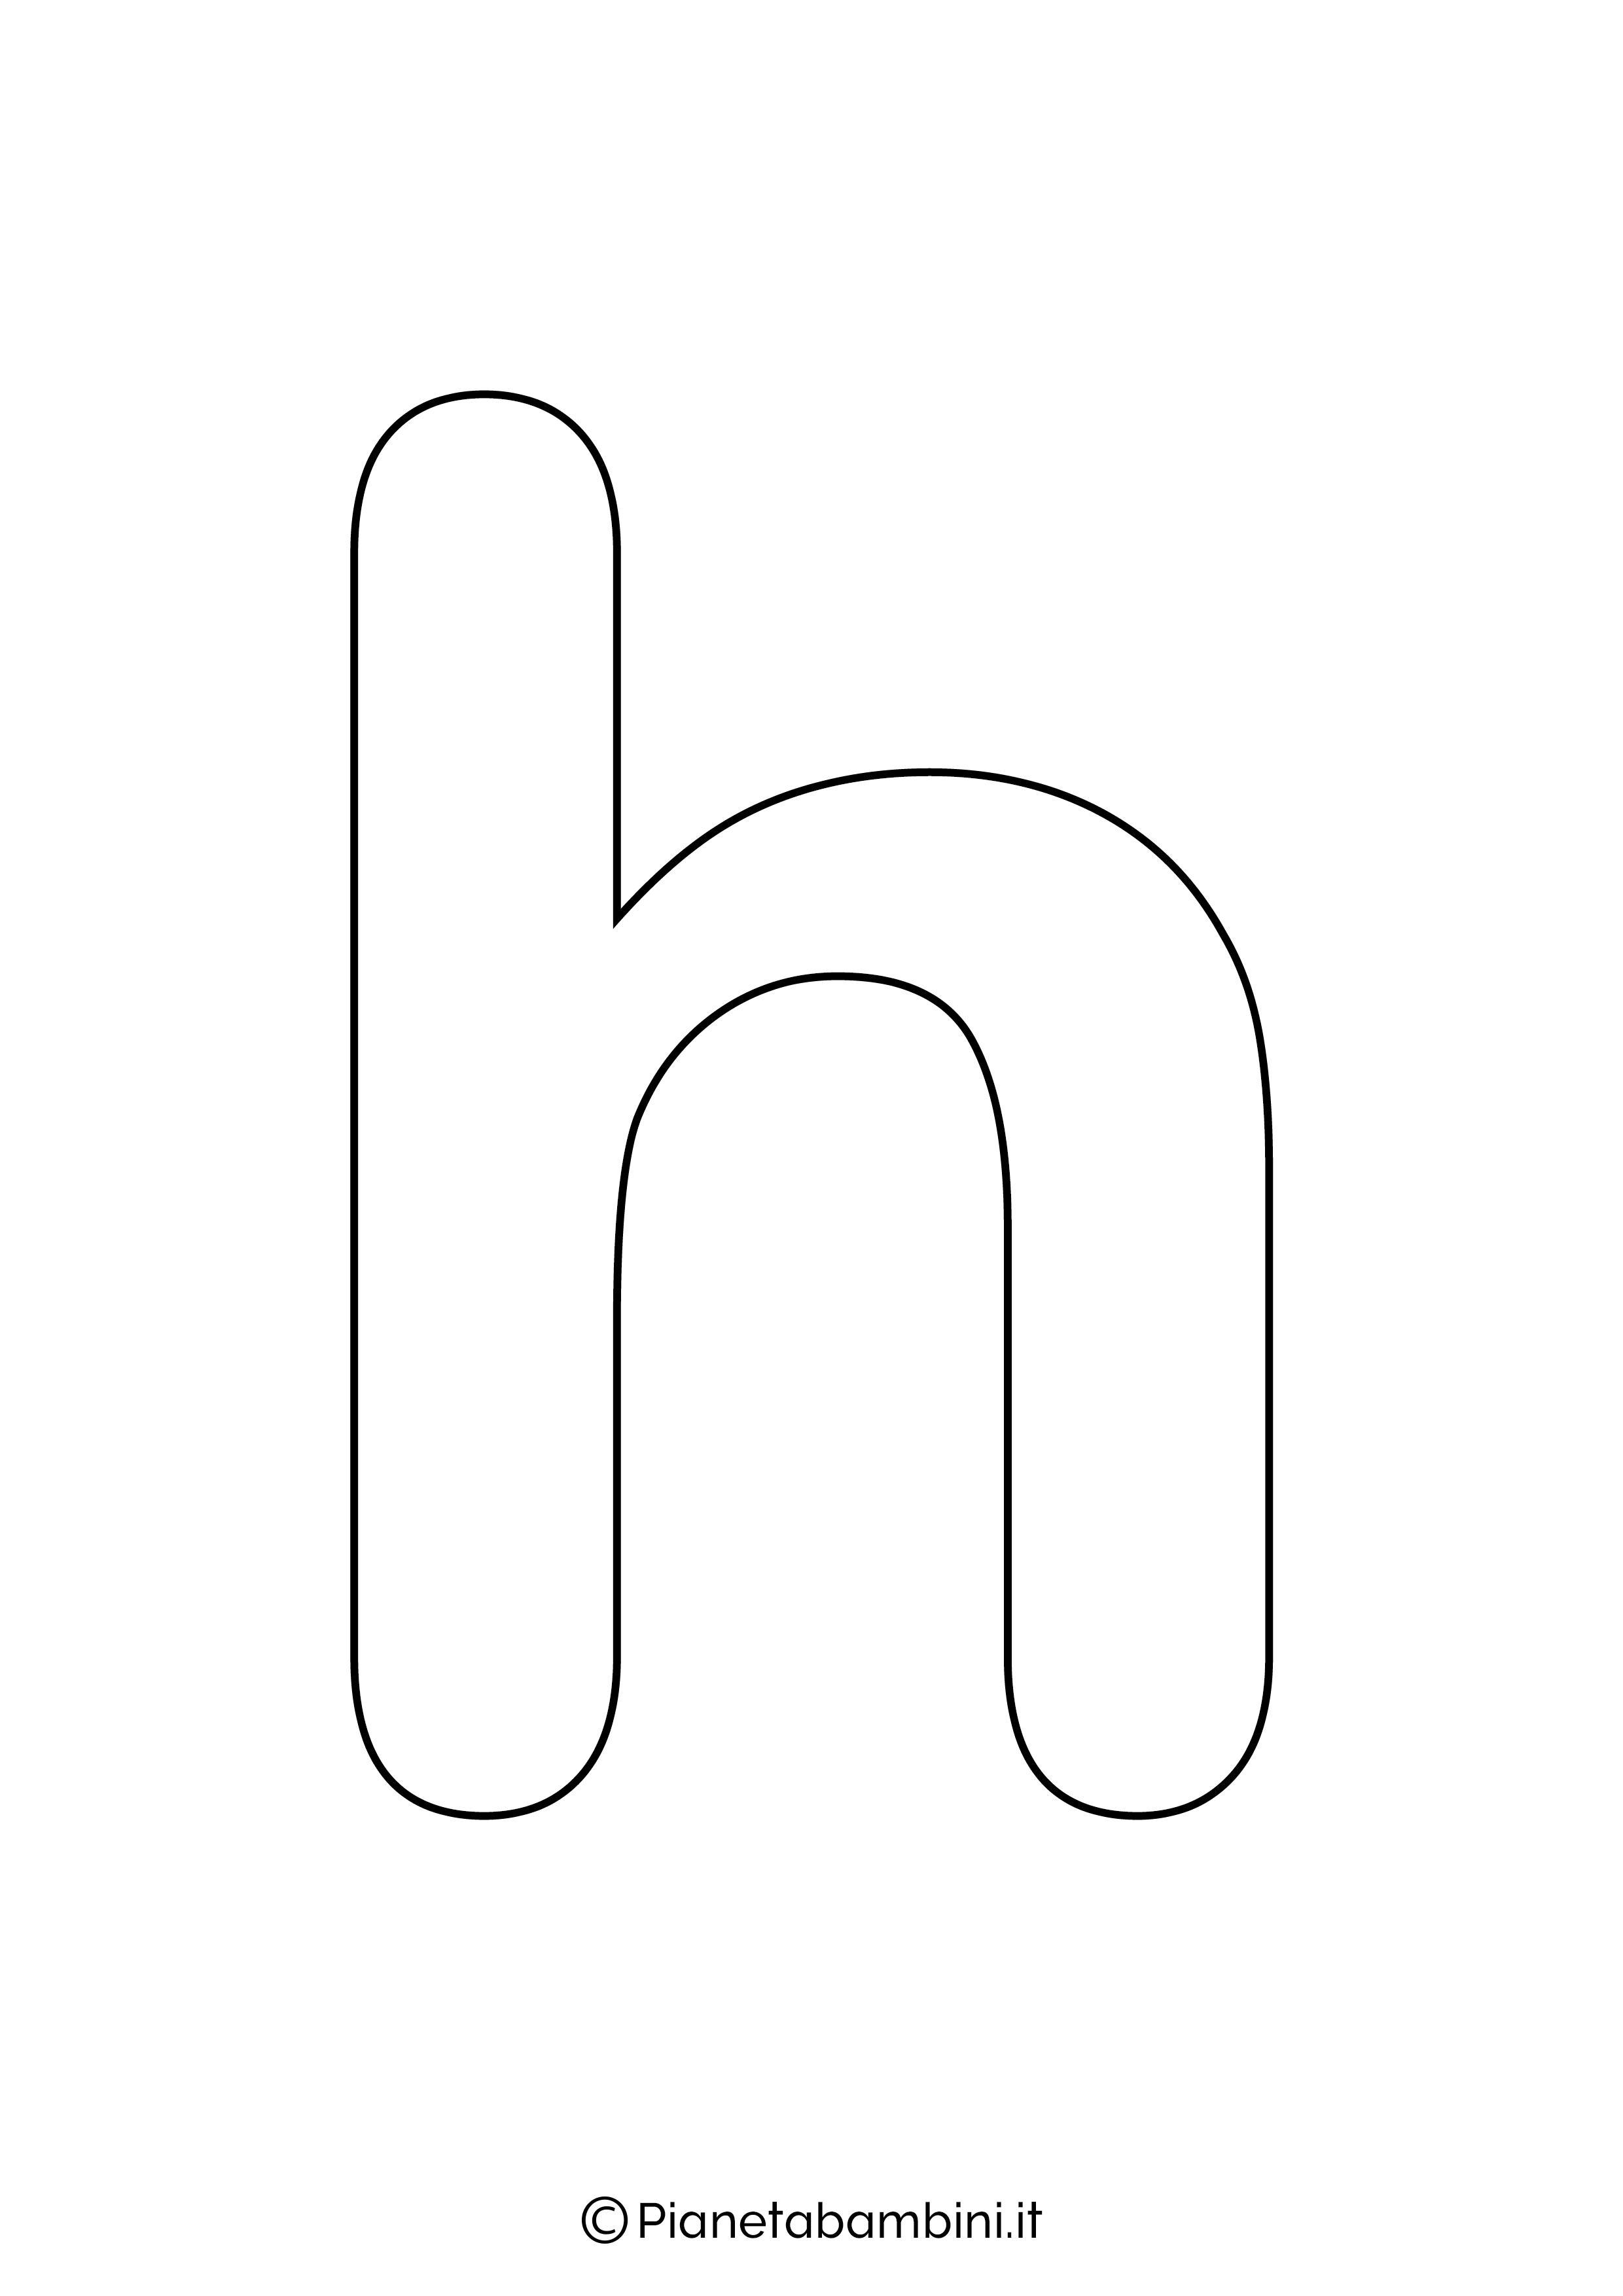 Lettera H minuscola da stampare